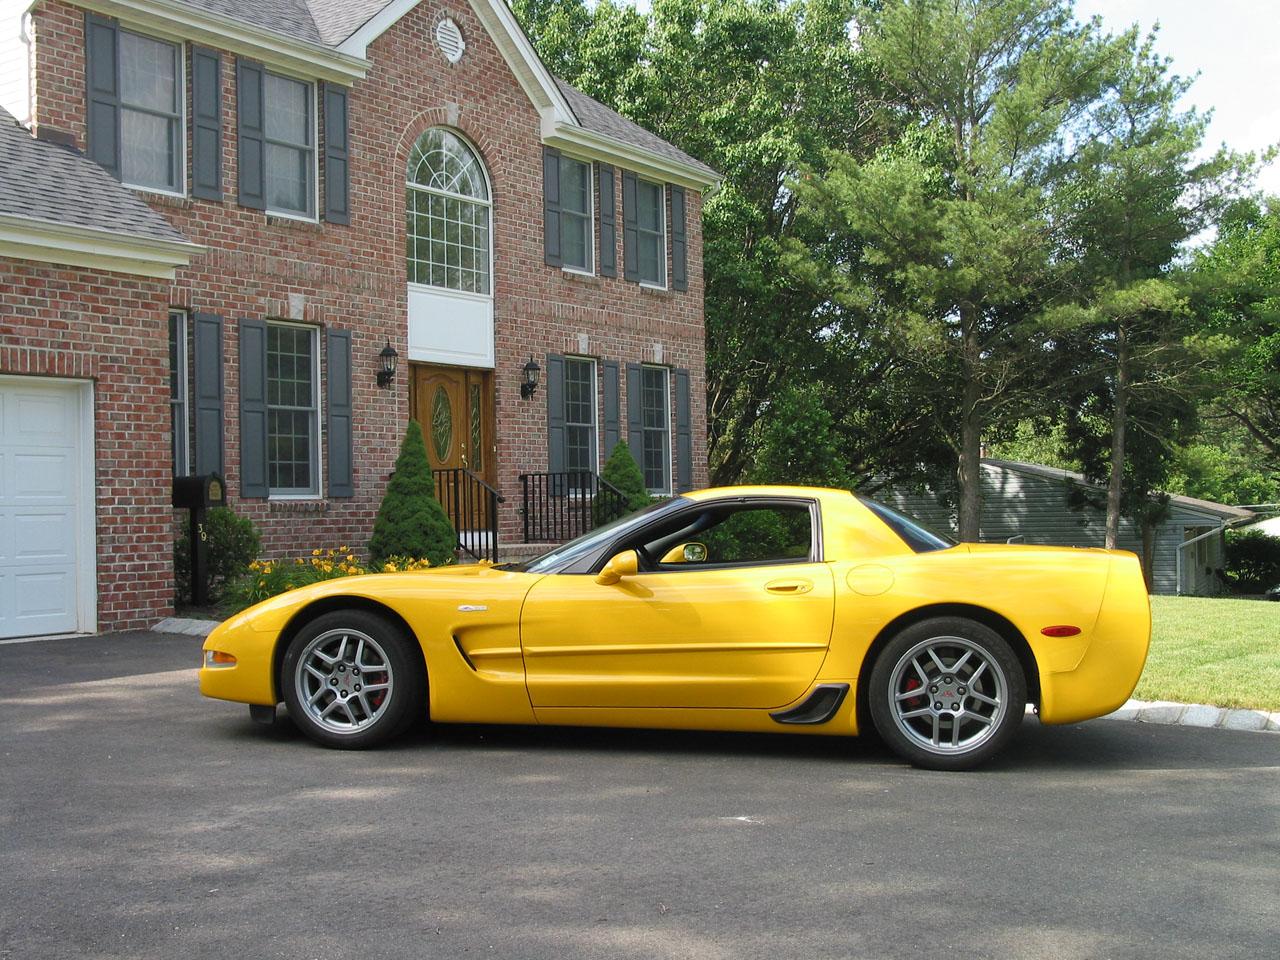 2004 Corvette Z06 Review | Car Reviews 2018